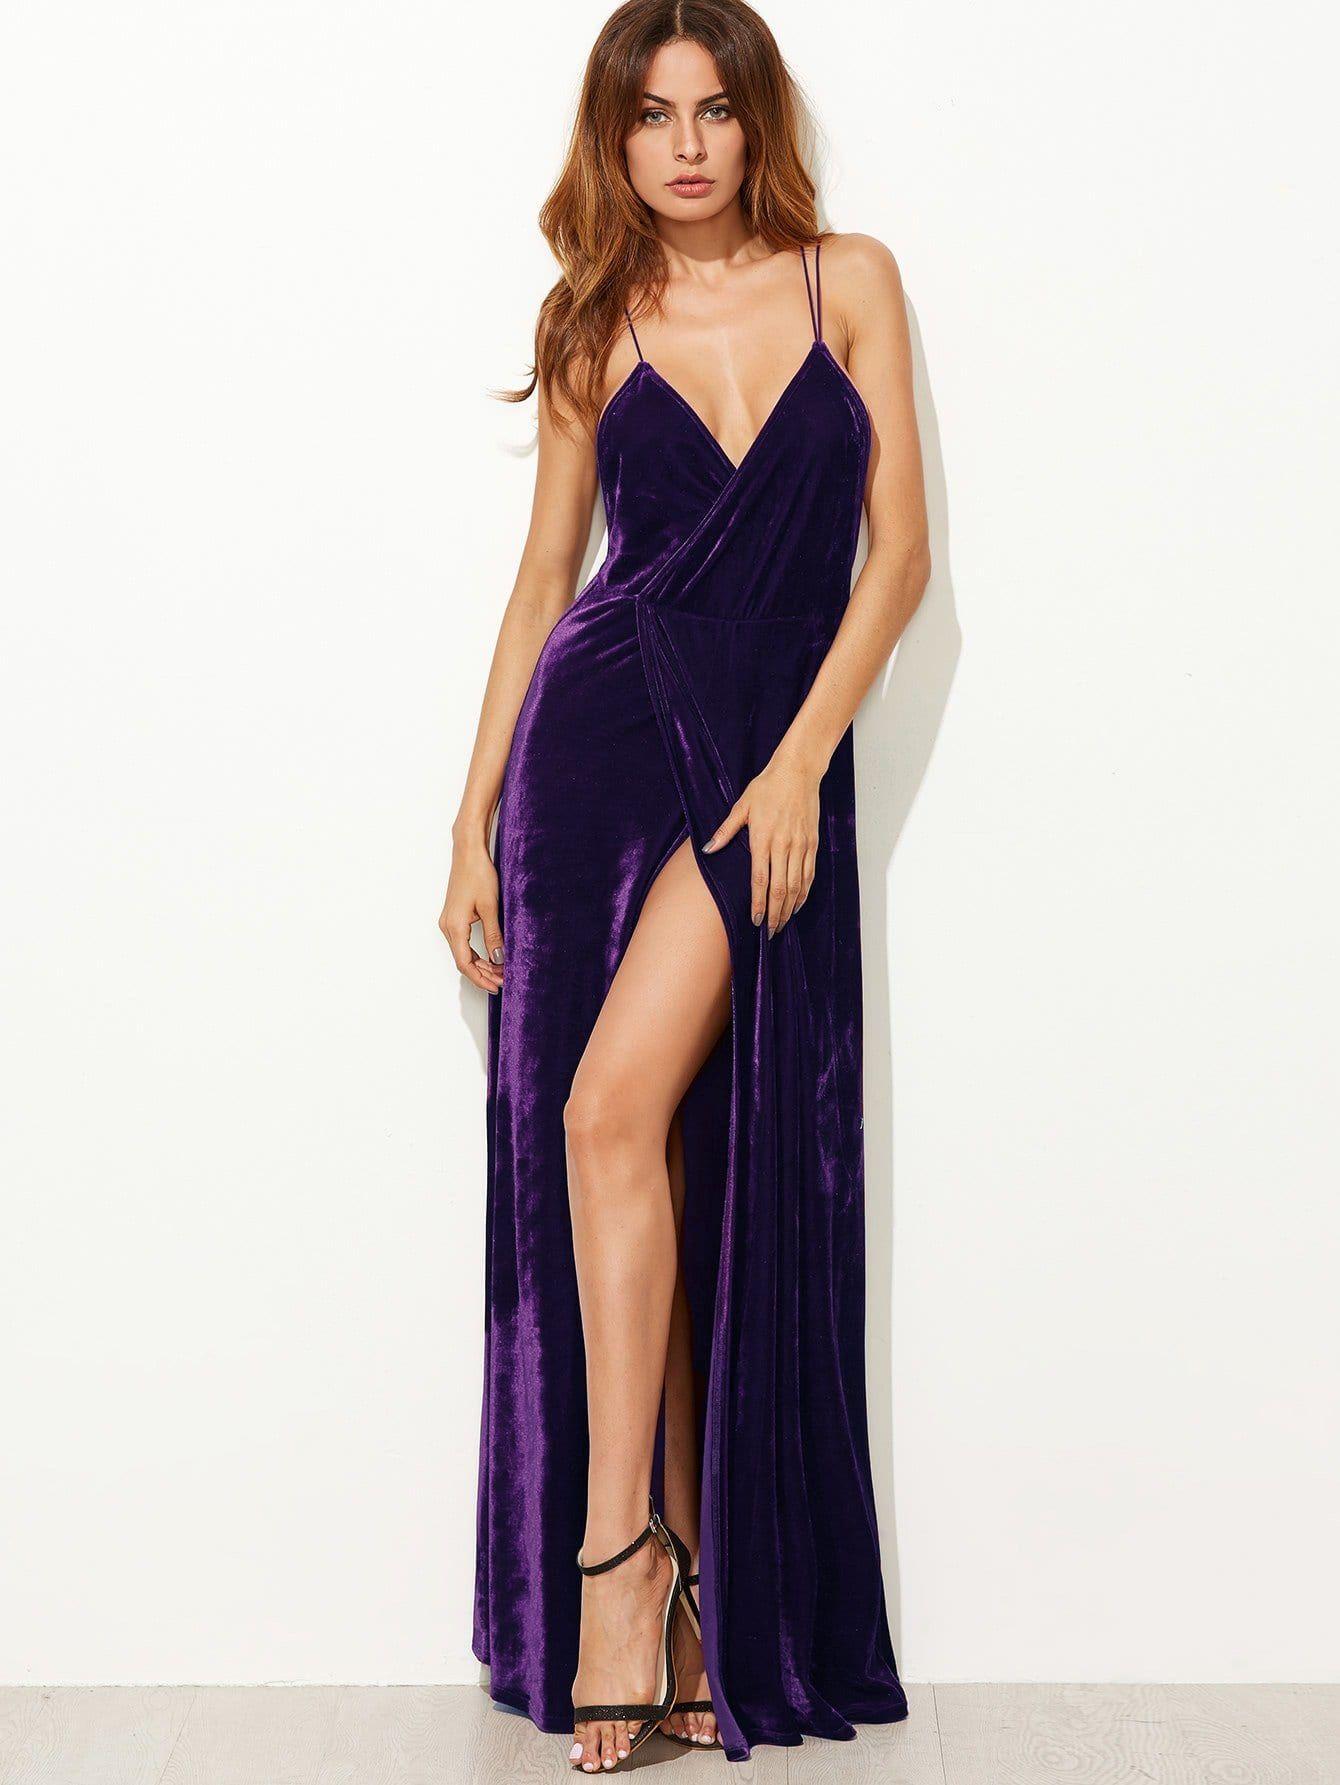 Strappy Backless Wrap Velvet Dress Backless Strappy Wrap Velvet Dress Long Backless Long Dress Summer Party Dress [ 1785 x 1340 Pixel ]